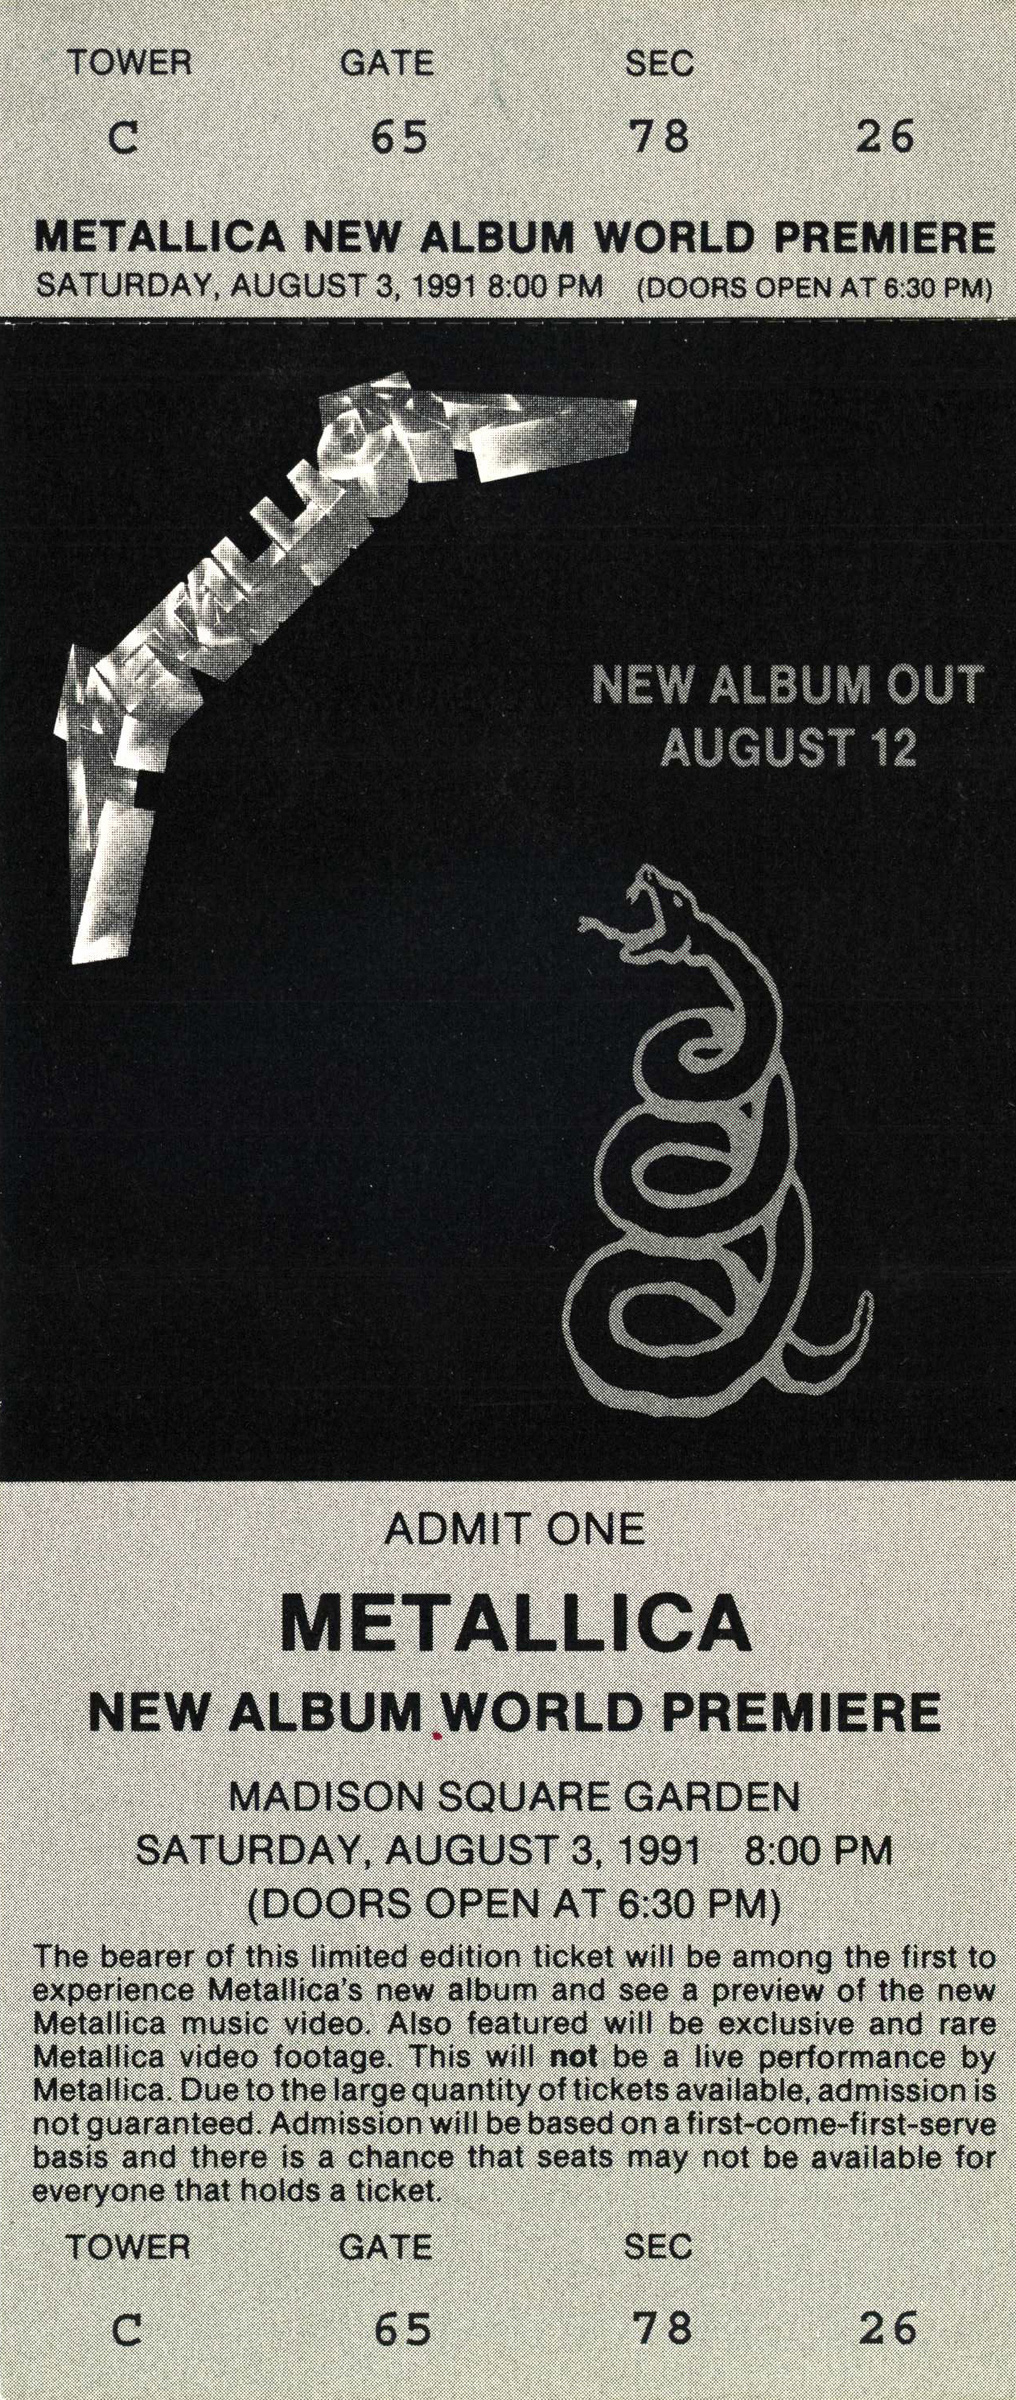 Metallica New Album World Premier 1991